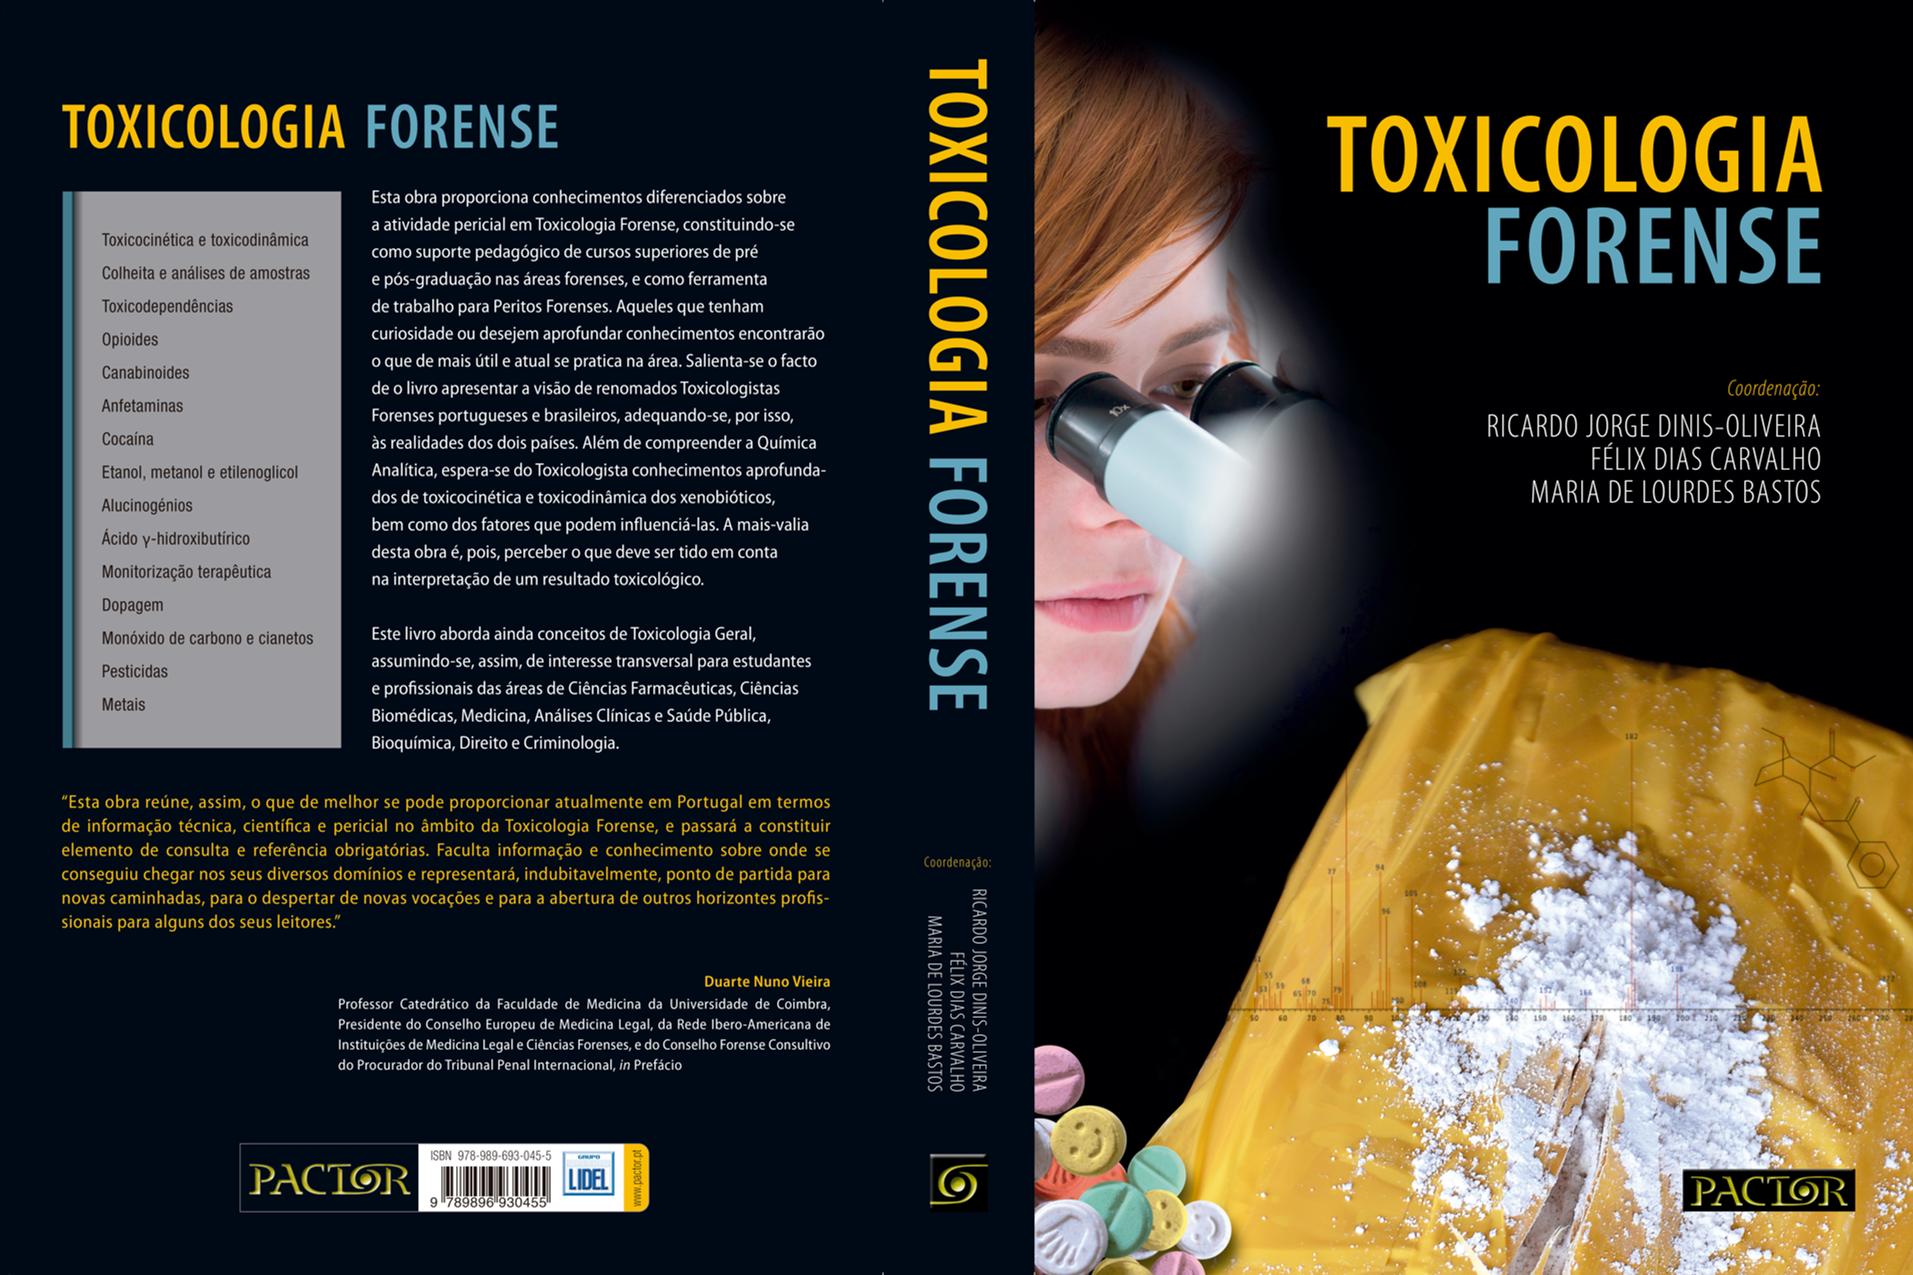 Livro de Toxicologia Forense